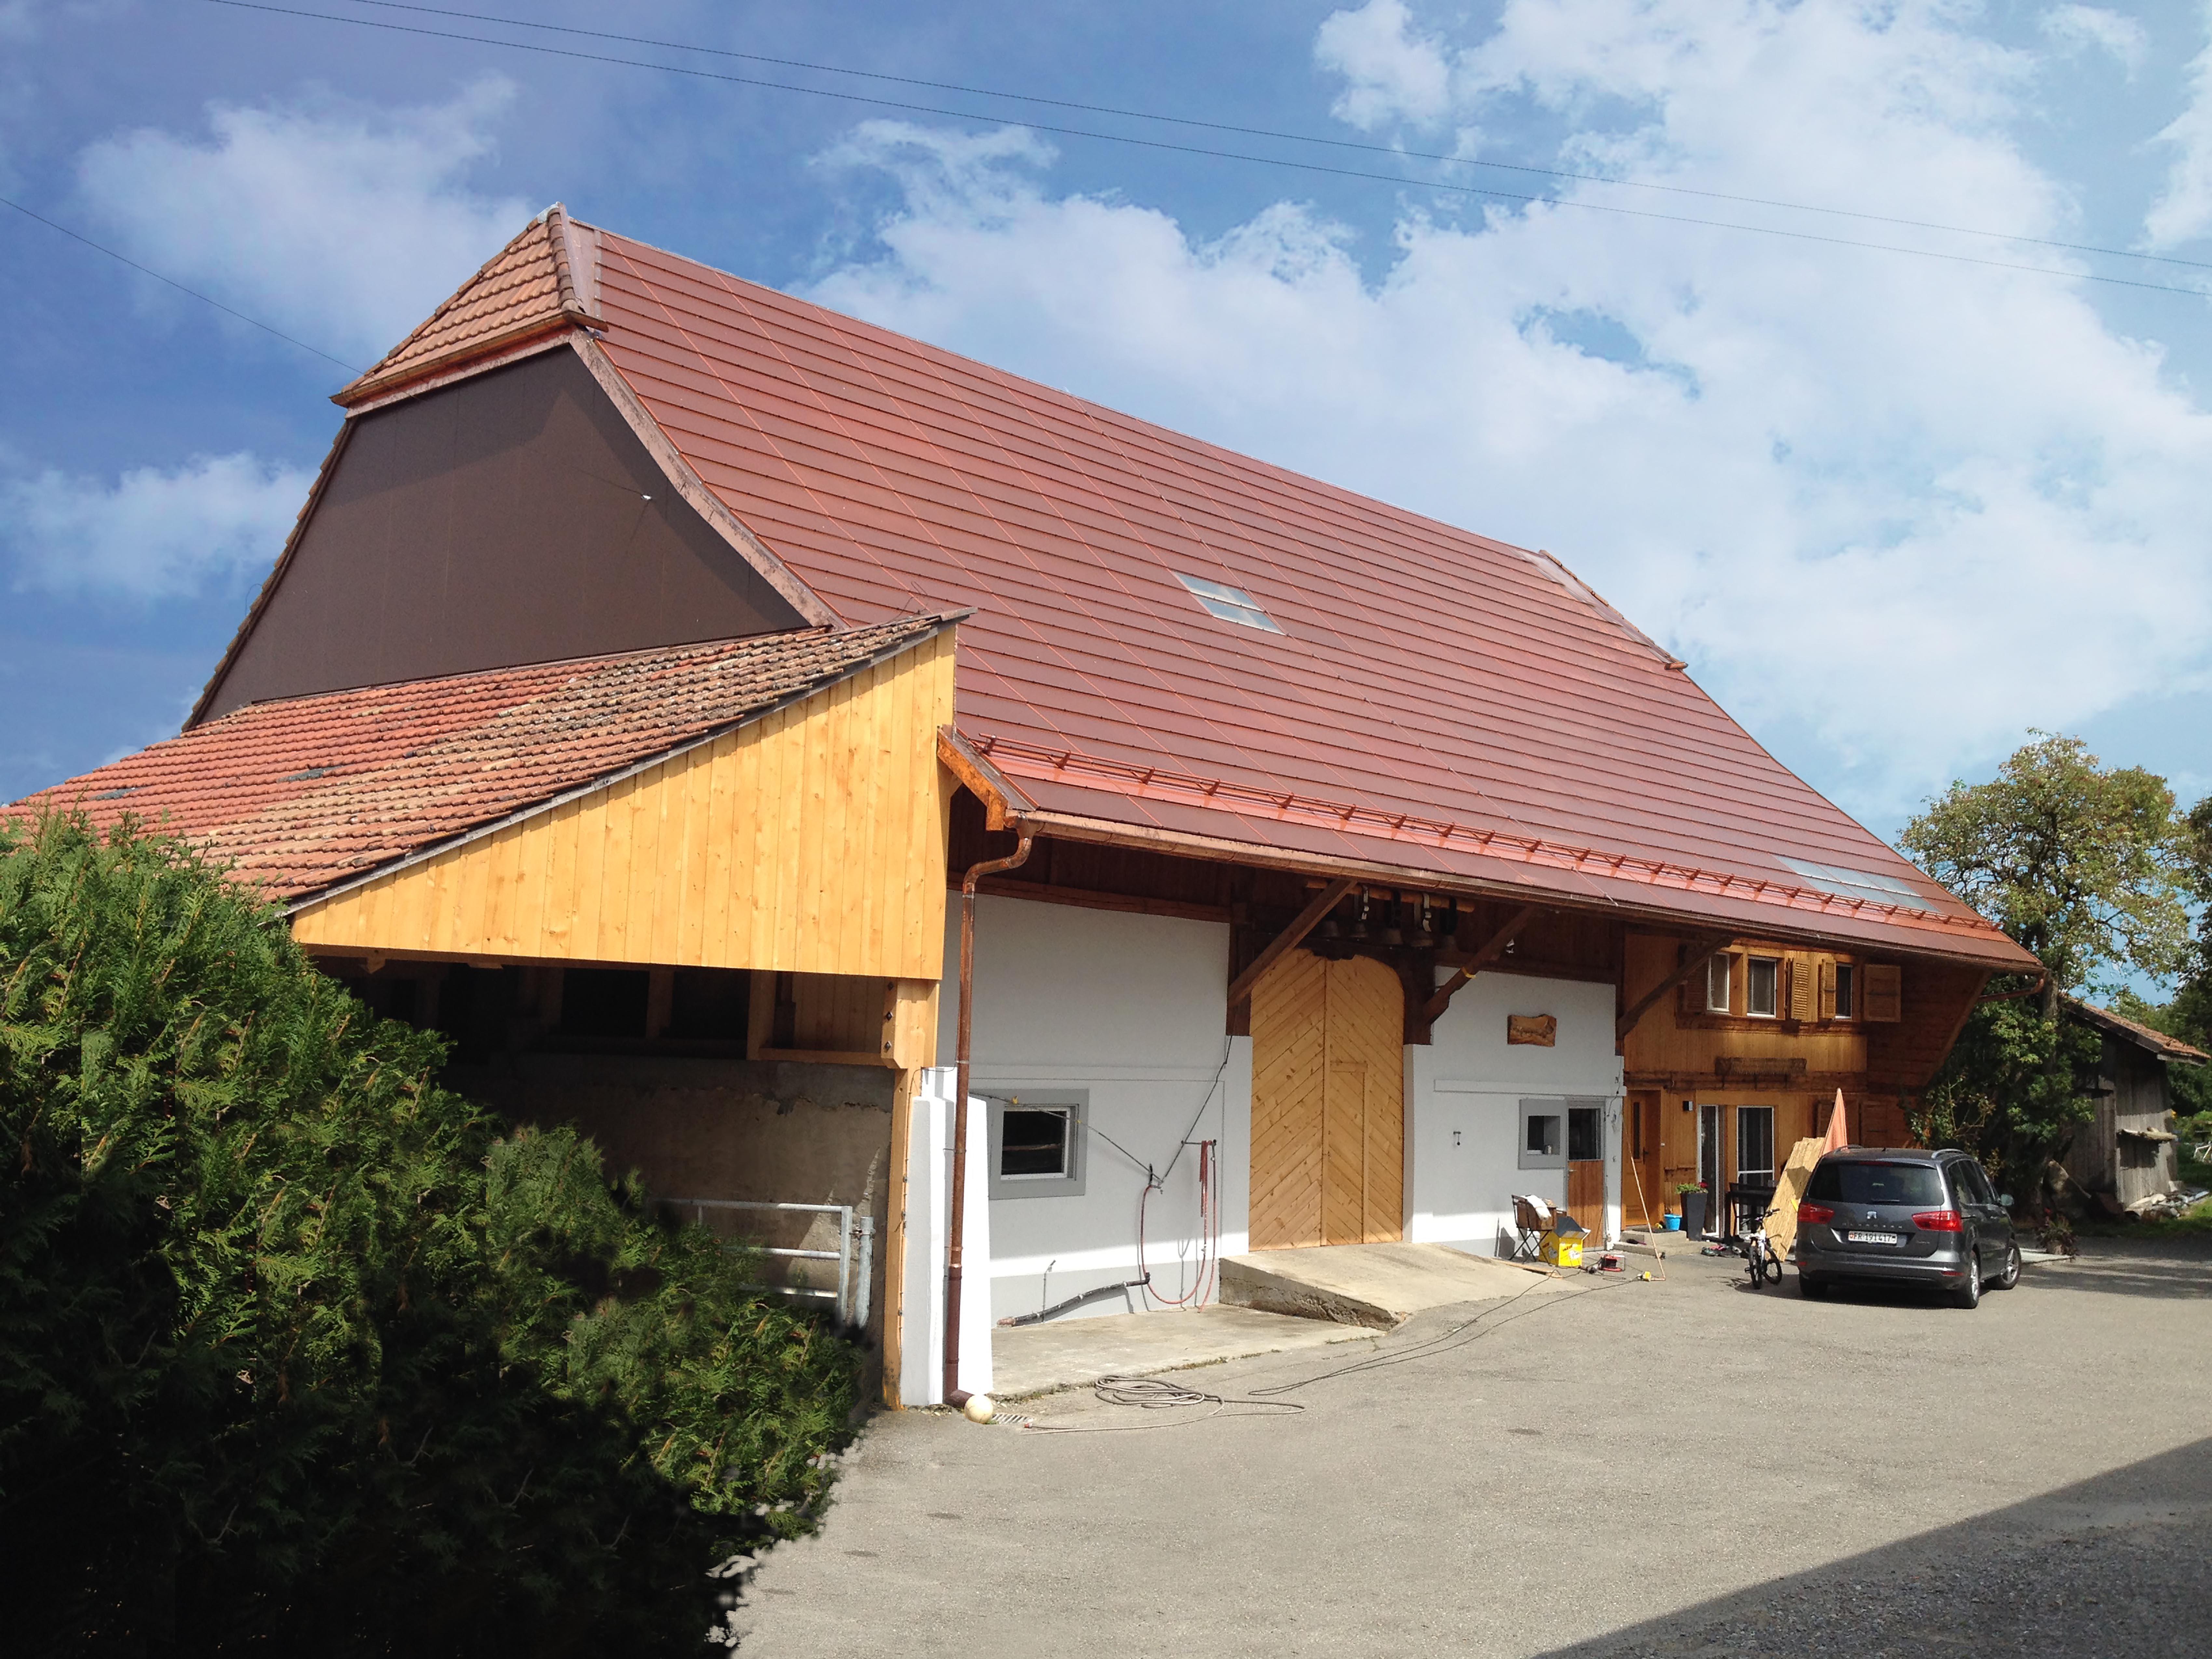 Projekt Terracotta 01 %C2%A9CSEM | Photovoltaik Österreich